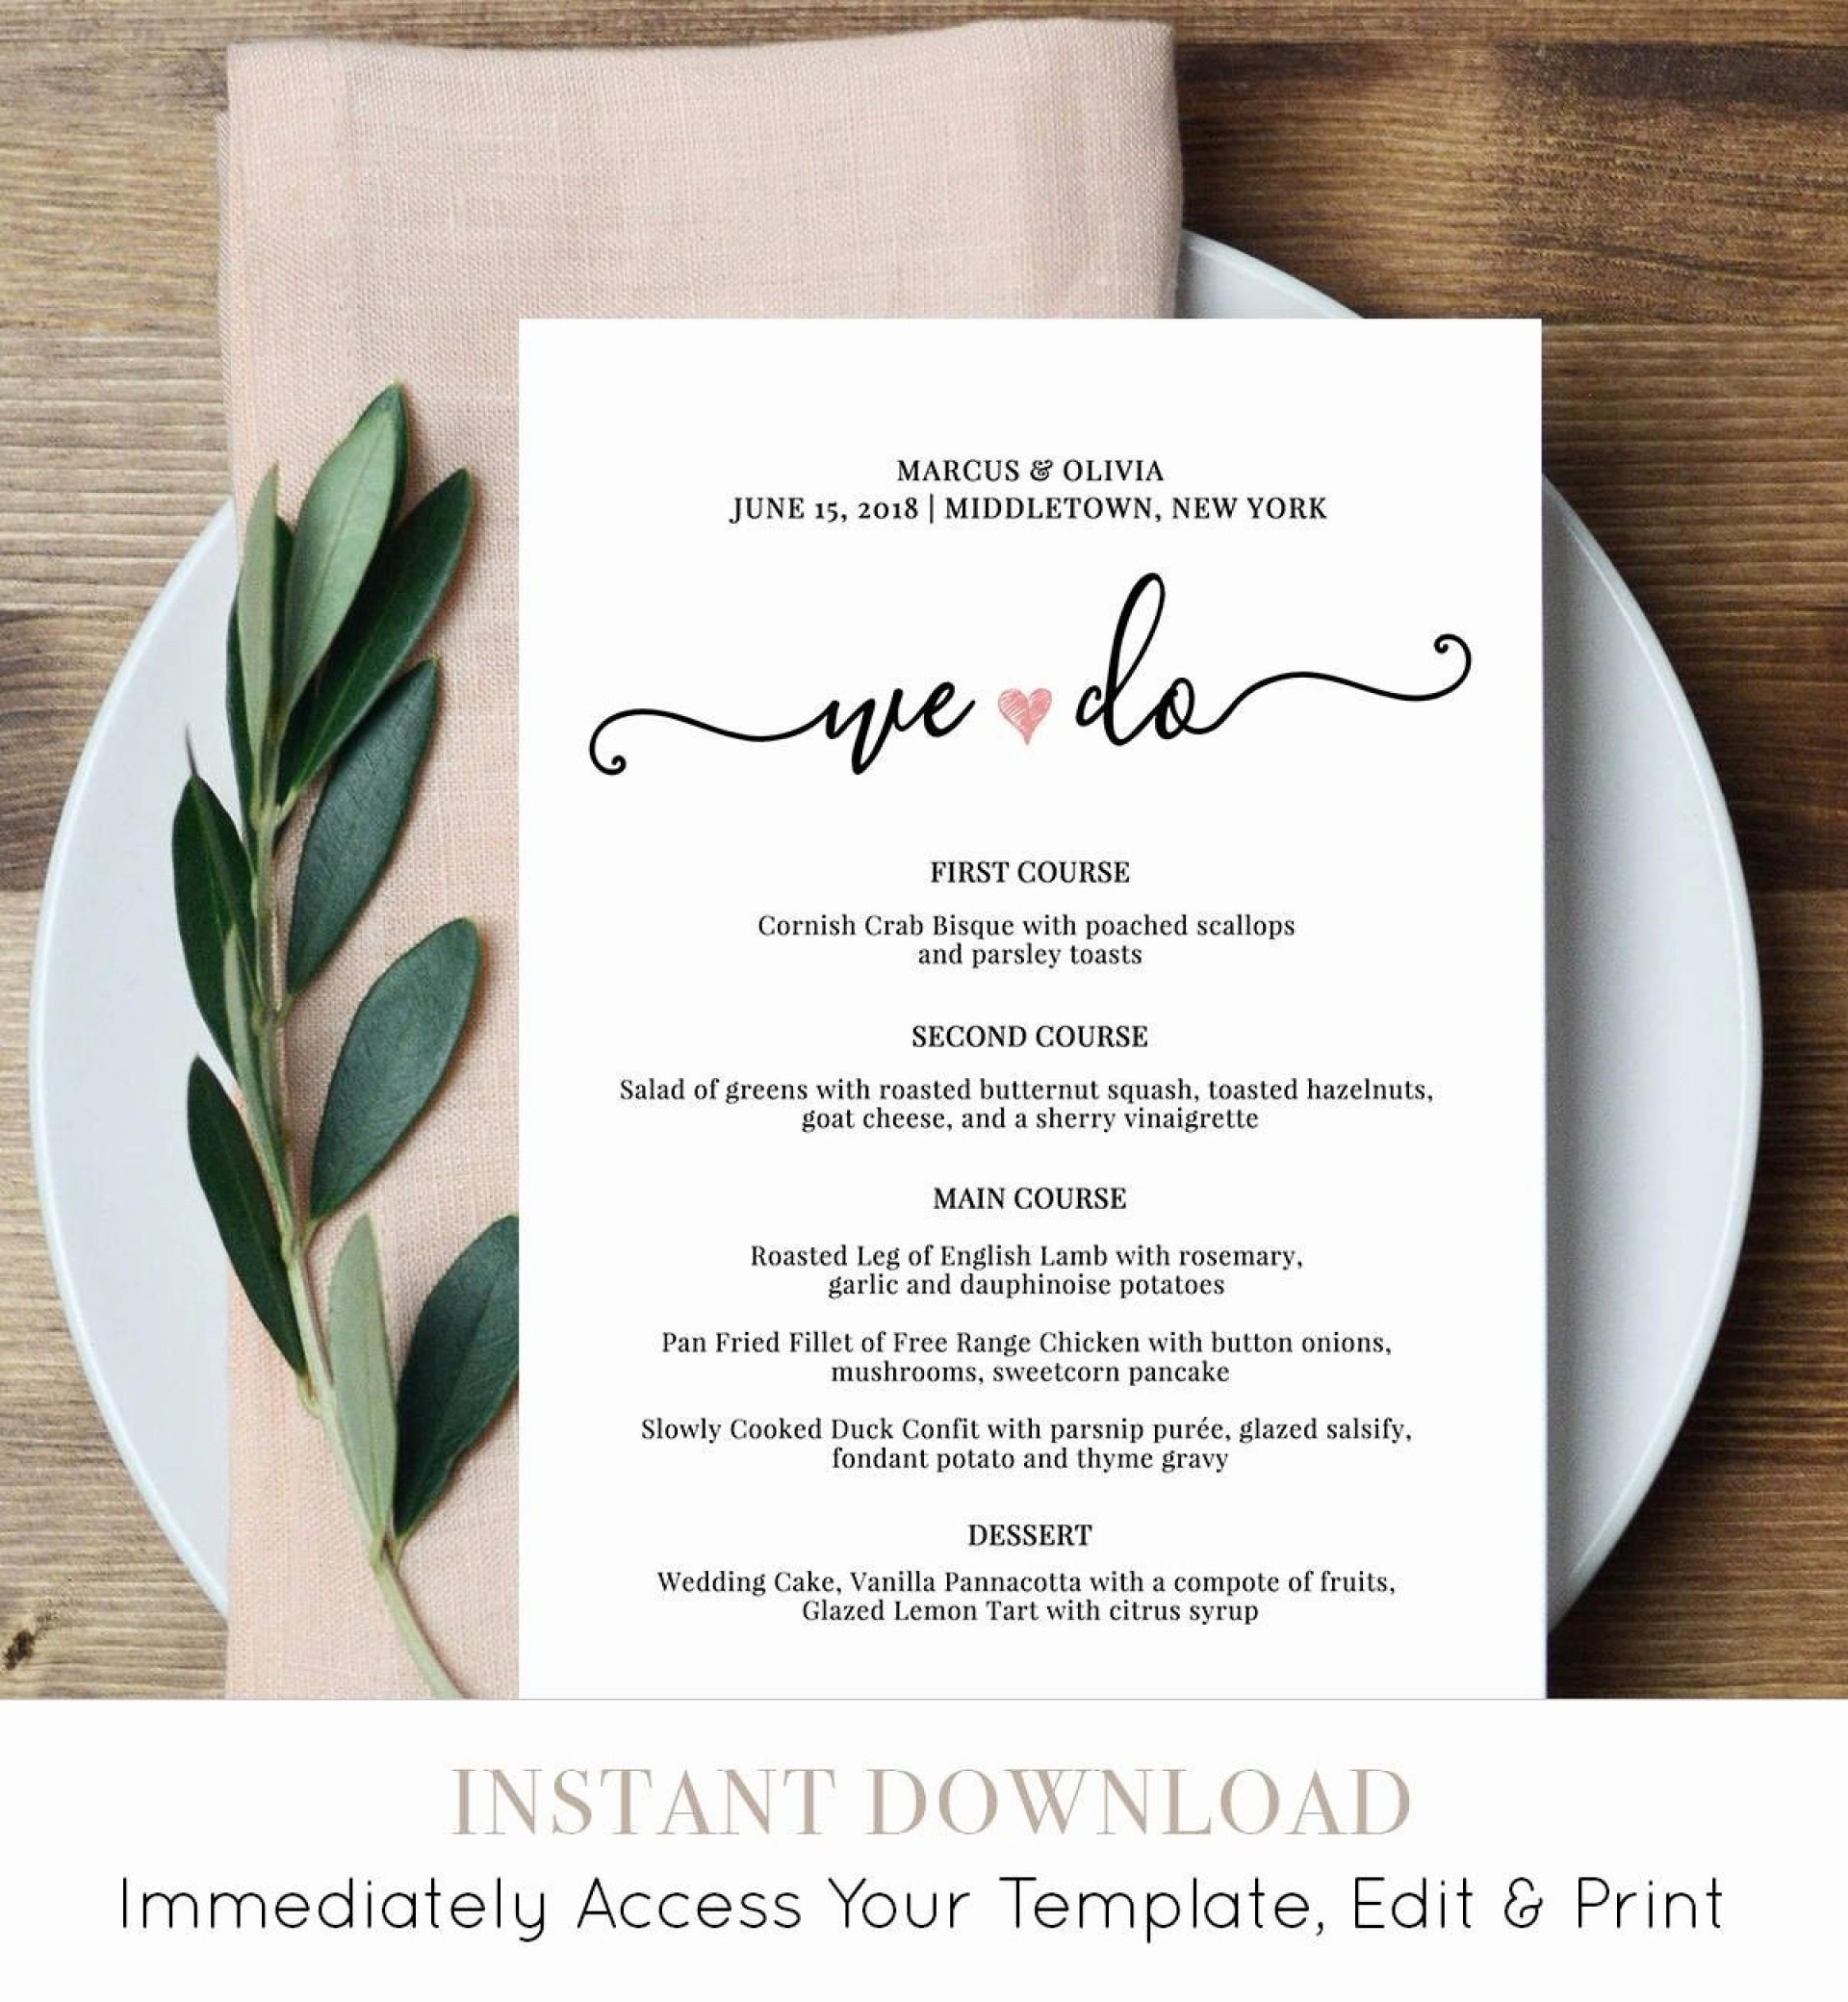 001 Surprising Menu Card Template Free Download Example  Indian Restaurant Design Cafe1920